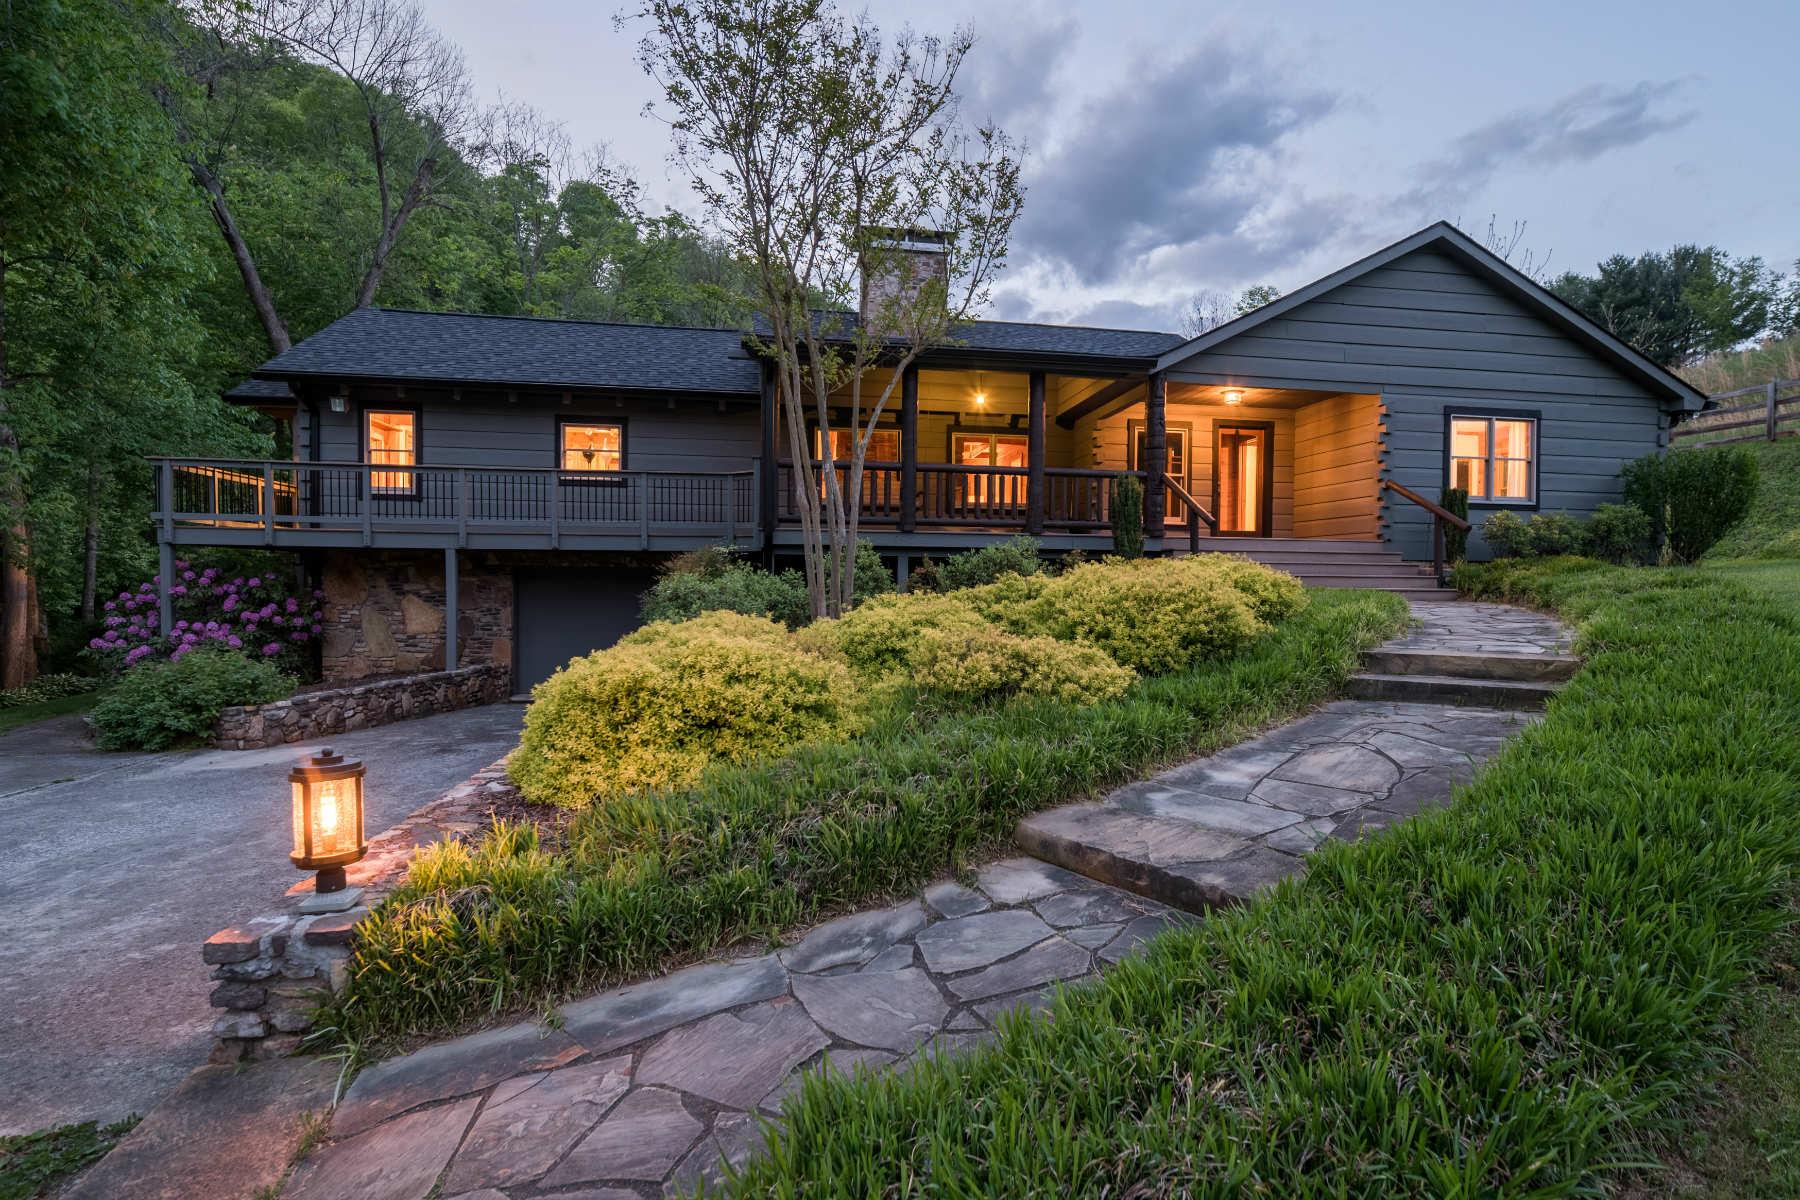 Newport Virginia Real Estate Photography